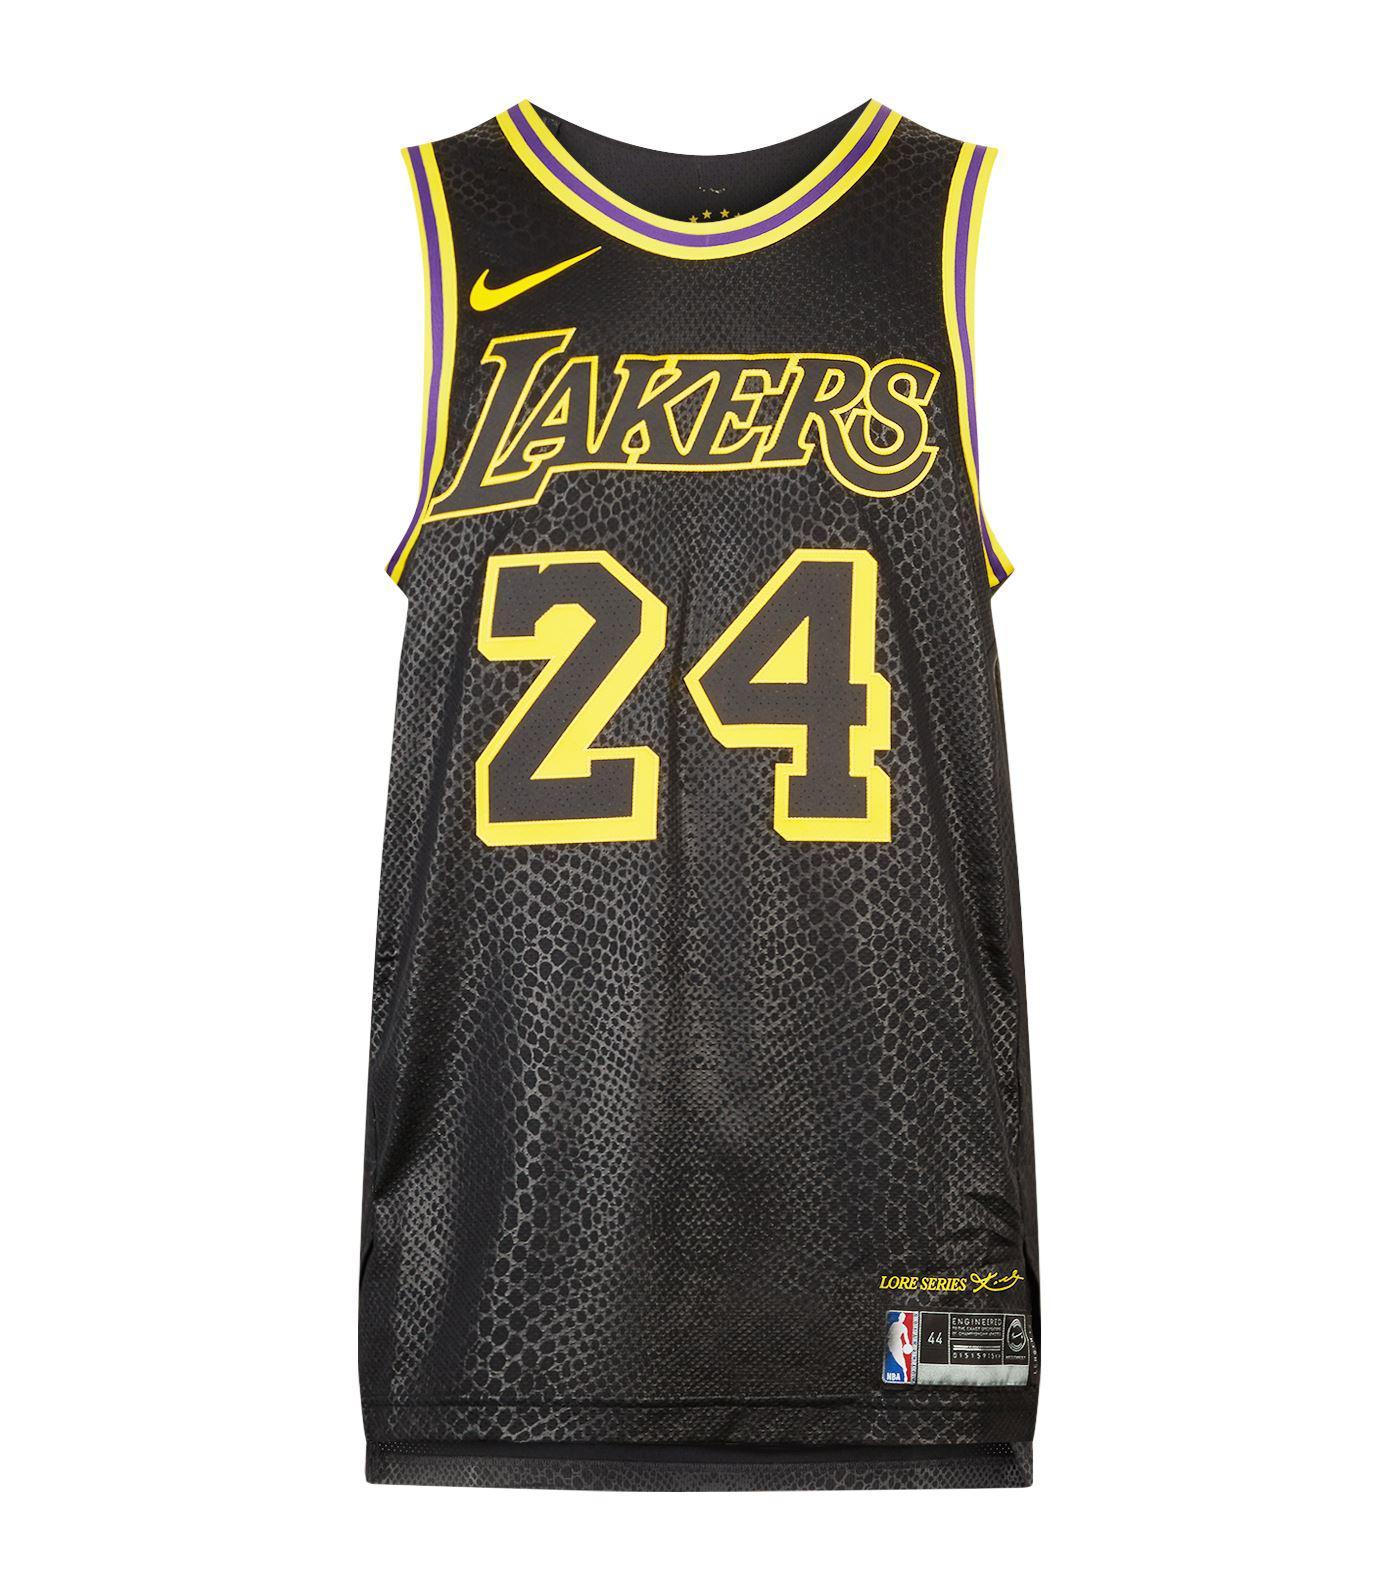 77f414041 Nike Kobe Bryant Lakers Jersey Tank in Black for Men - Lyst